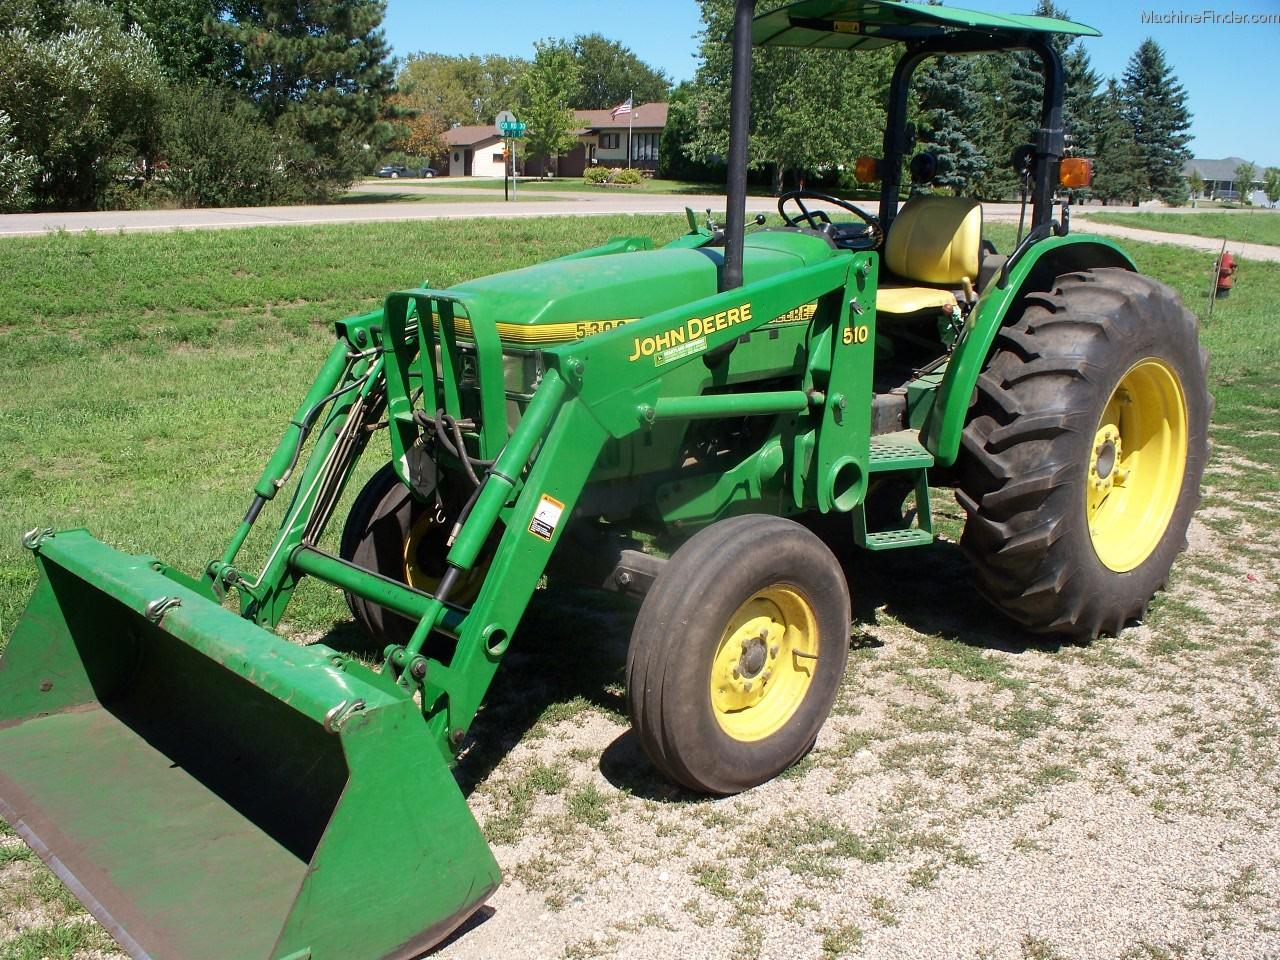 1993 John Deere 5300 Tractors - Utility (40-100hp) - John ...